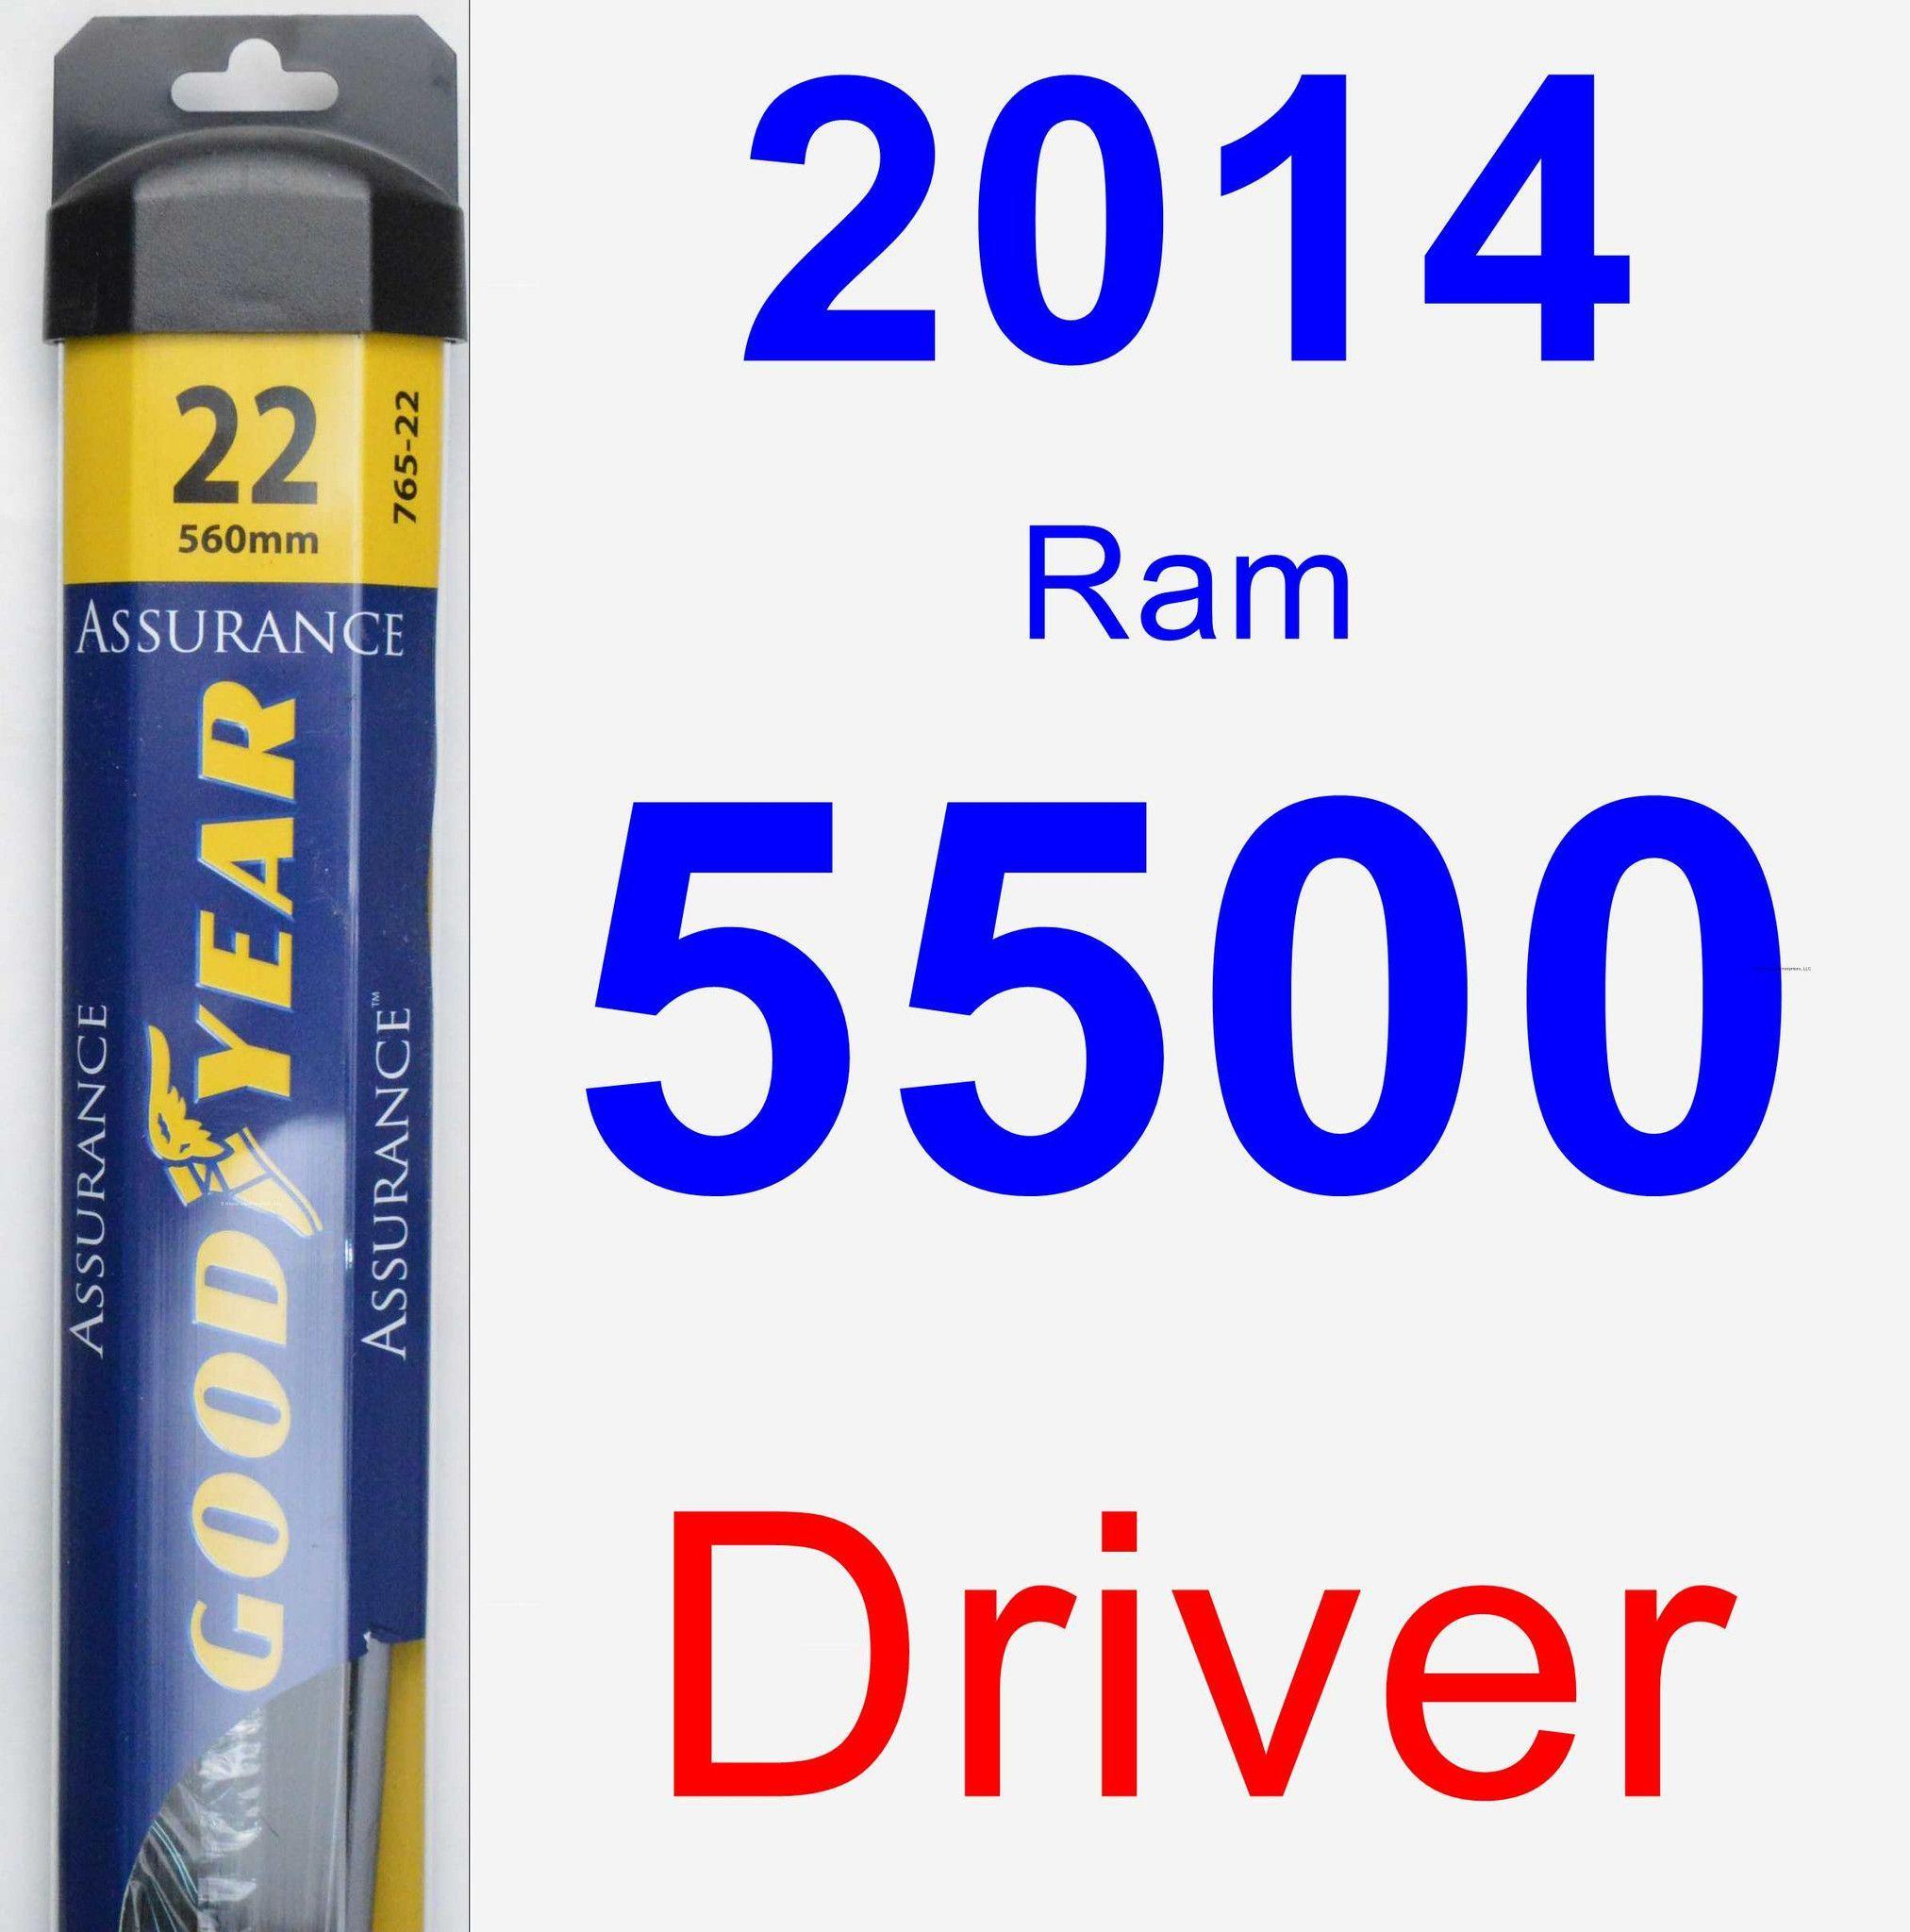 Driver Wiper Blade for 2014 Ram 5500 - Assurance